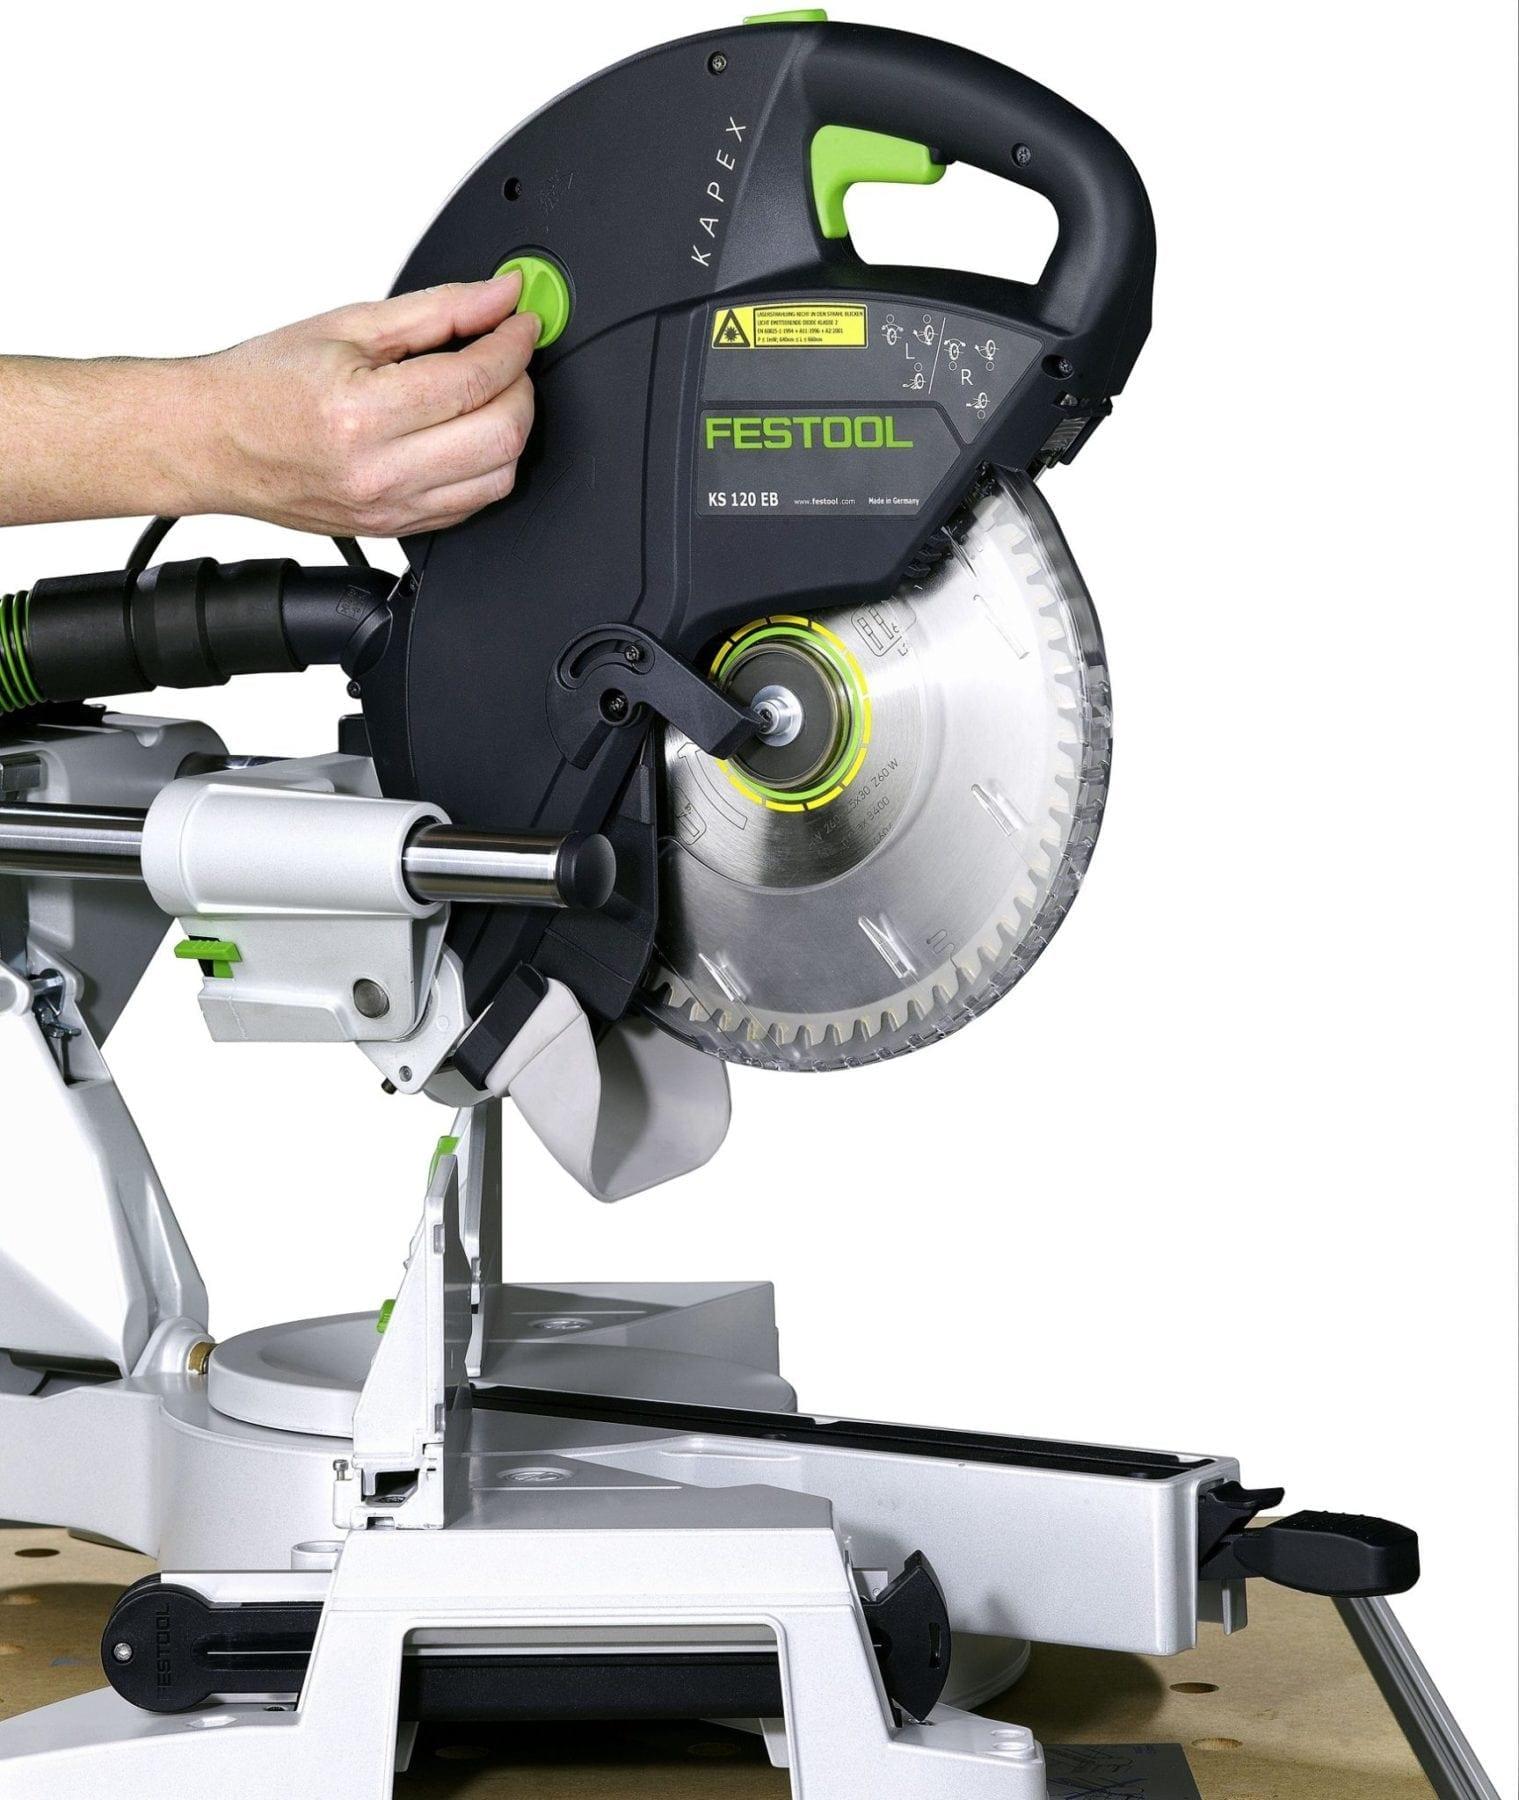 festool 561287 kapex ks 120 sliding compound miter saw tool authority. Black Bedroom Furniture Sets. Home Design Ideas